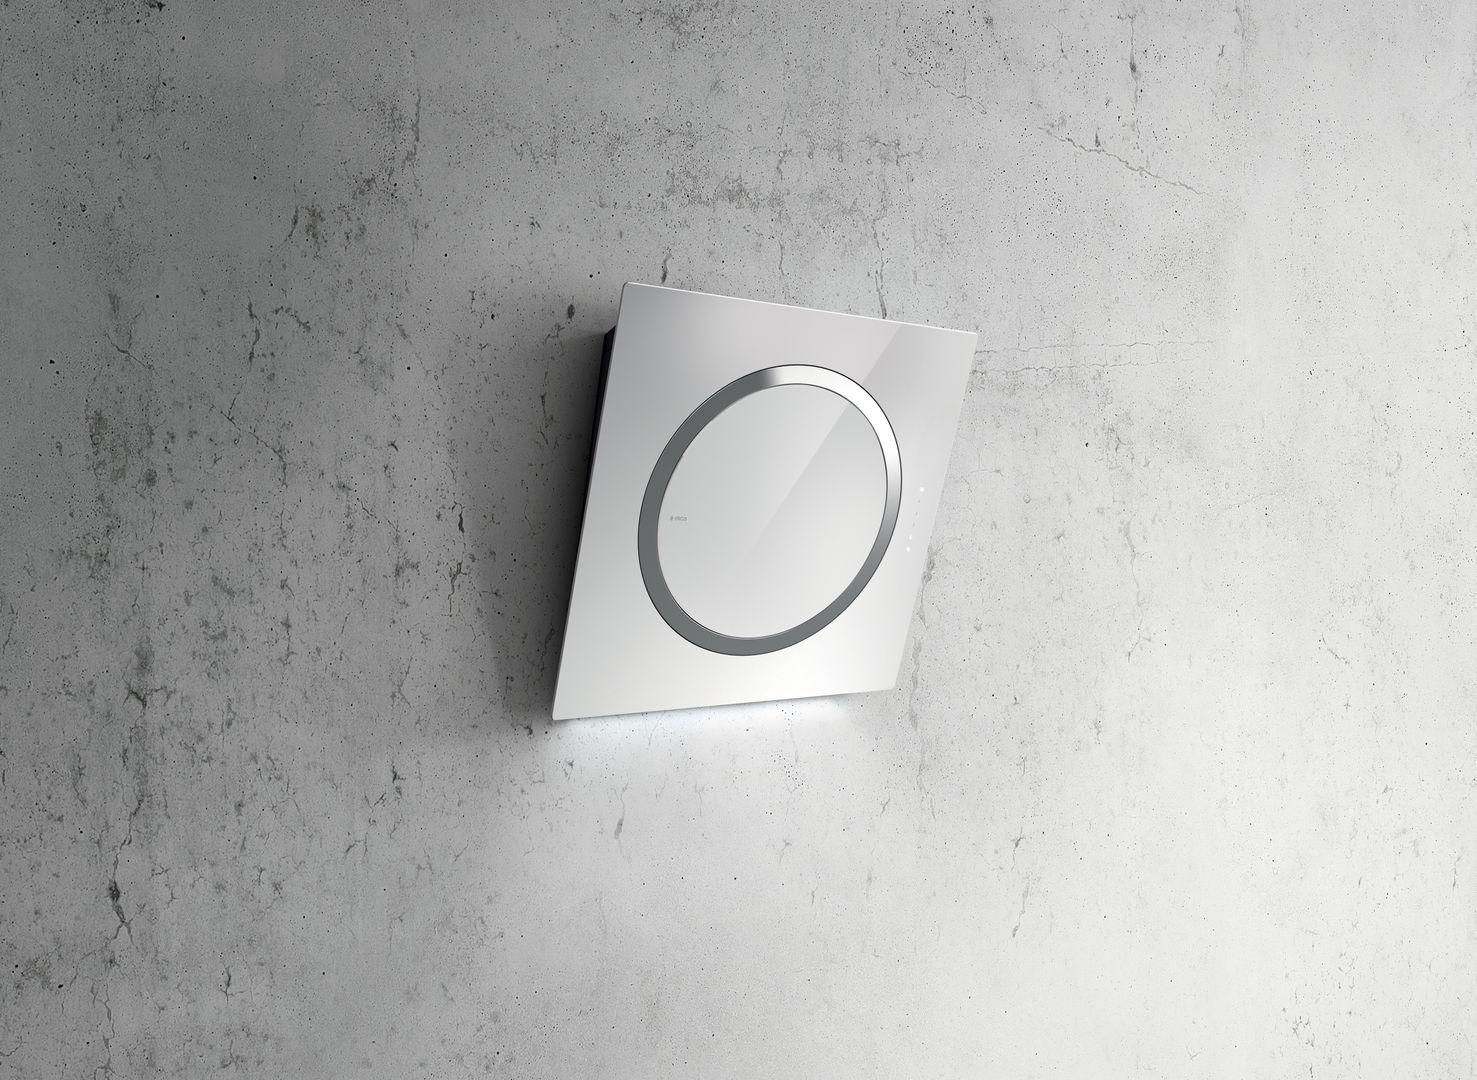 Elica om air sense wh f 75 dunstabzugshaube 75 cm weiß prf0110537